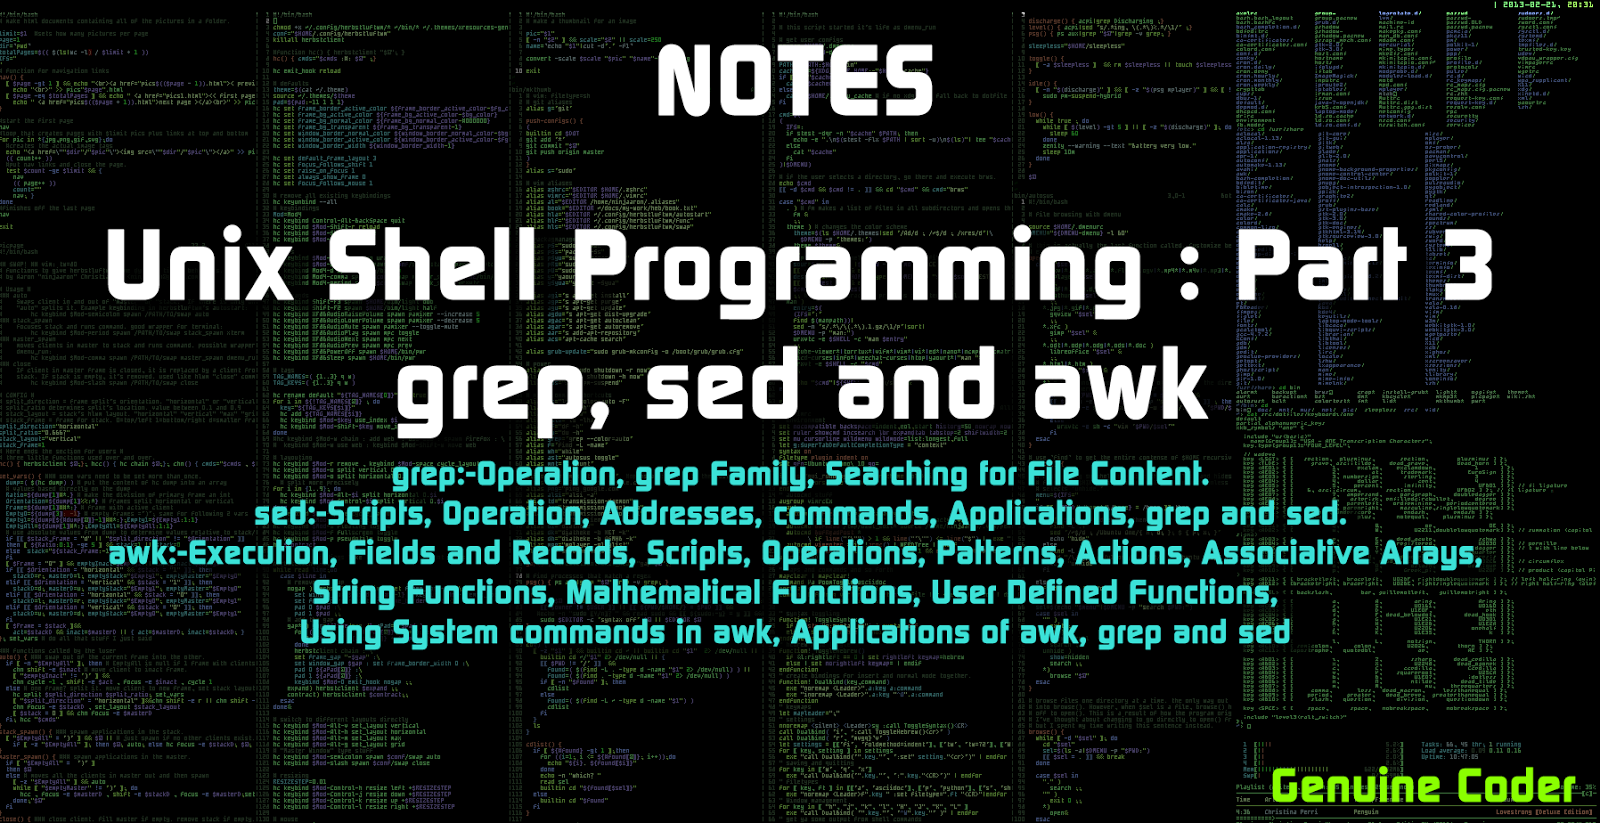 unix shell programming : grep,sed and awk